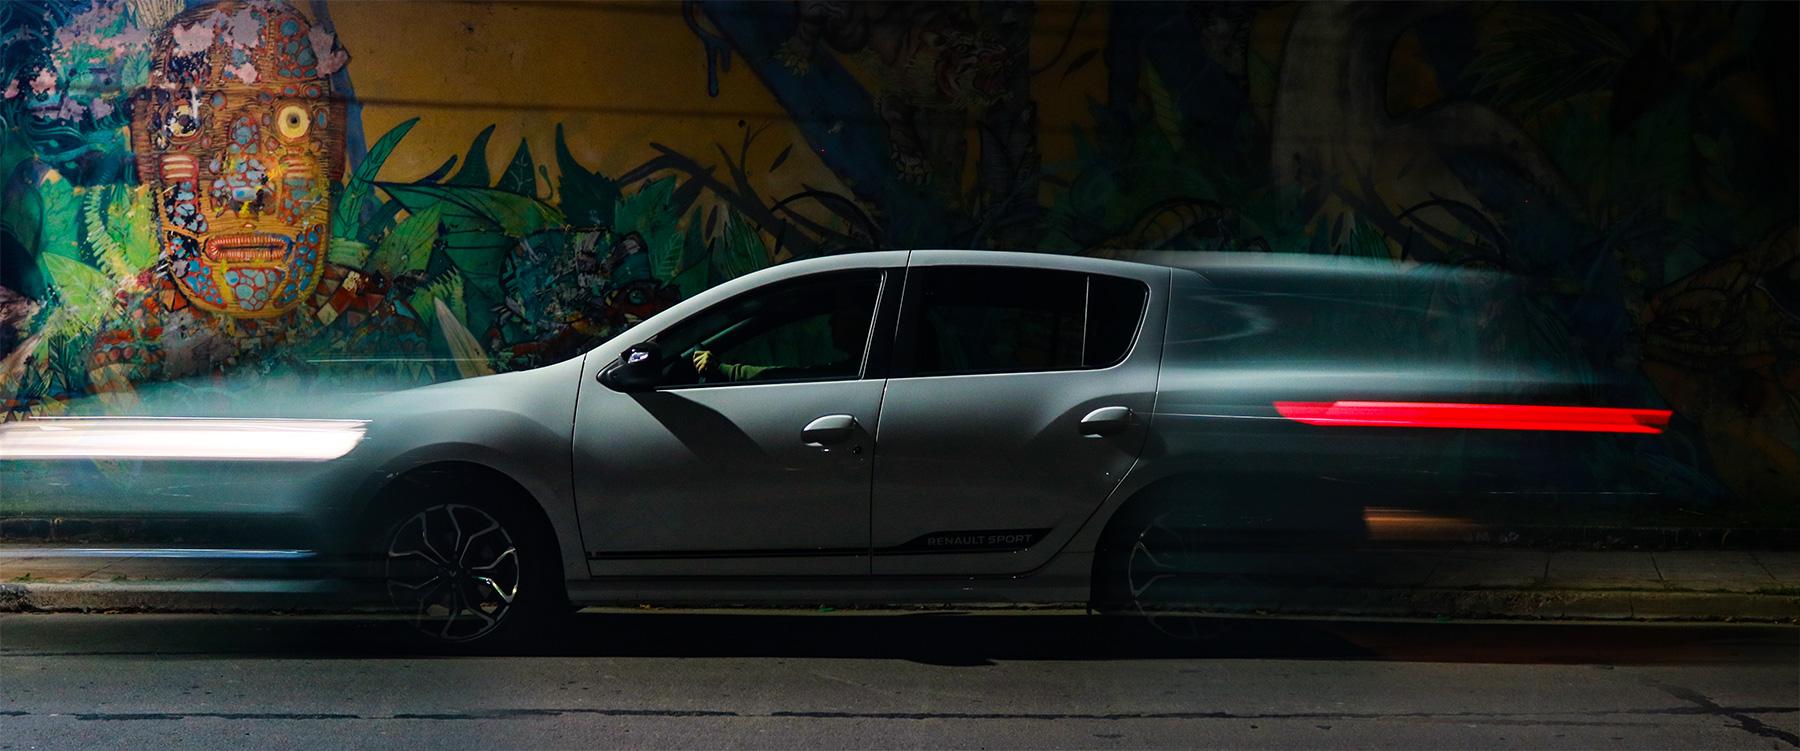 Test Drive: Renault Sandero R.S. 2020